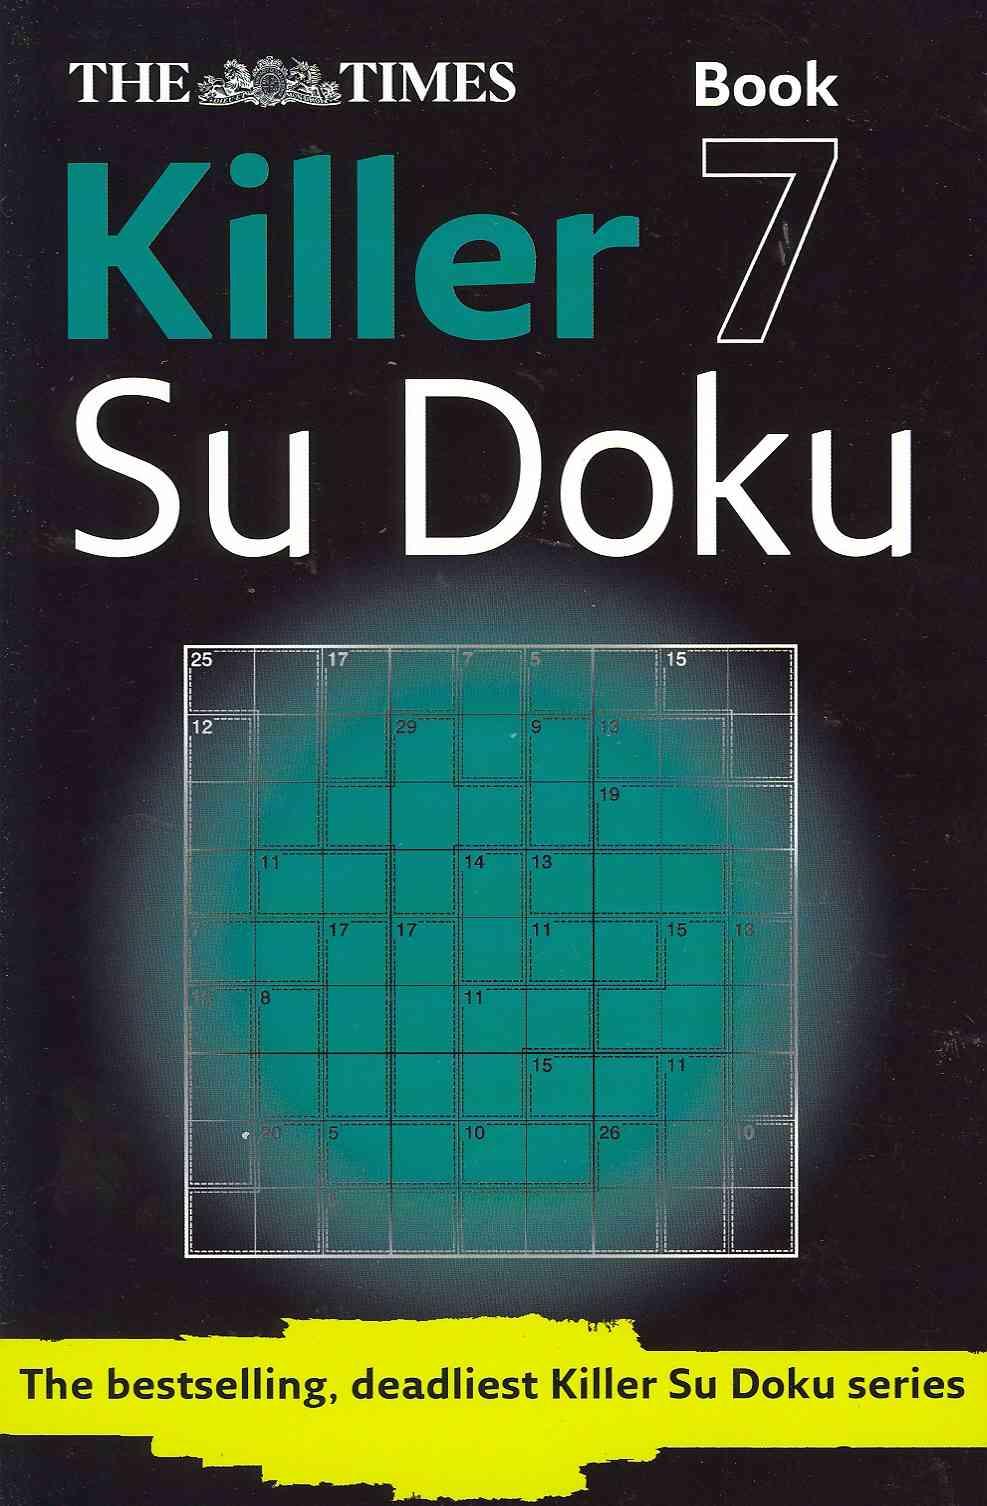 Killer Su Doku Book 7 By Times Books (COR)